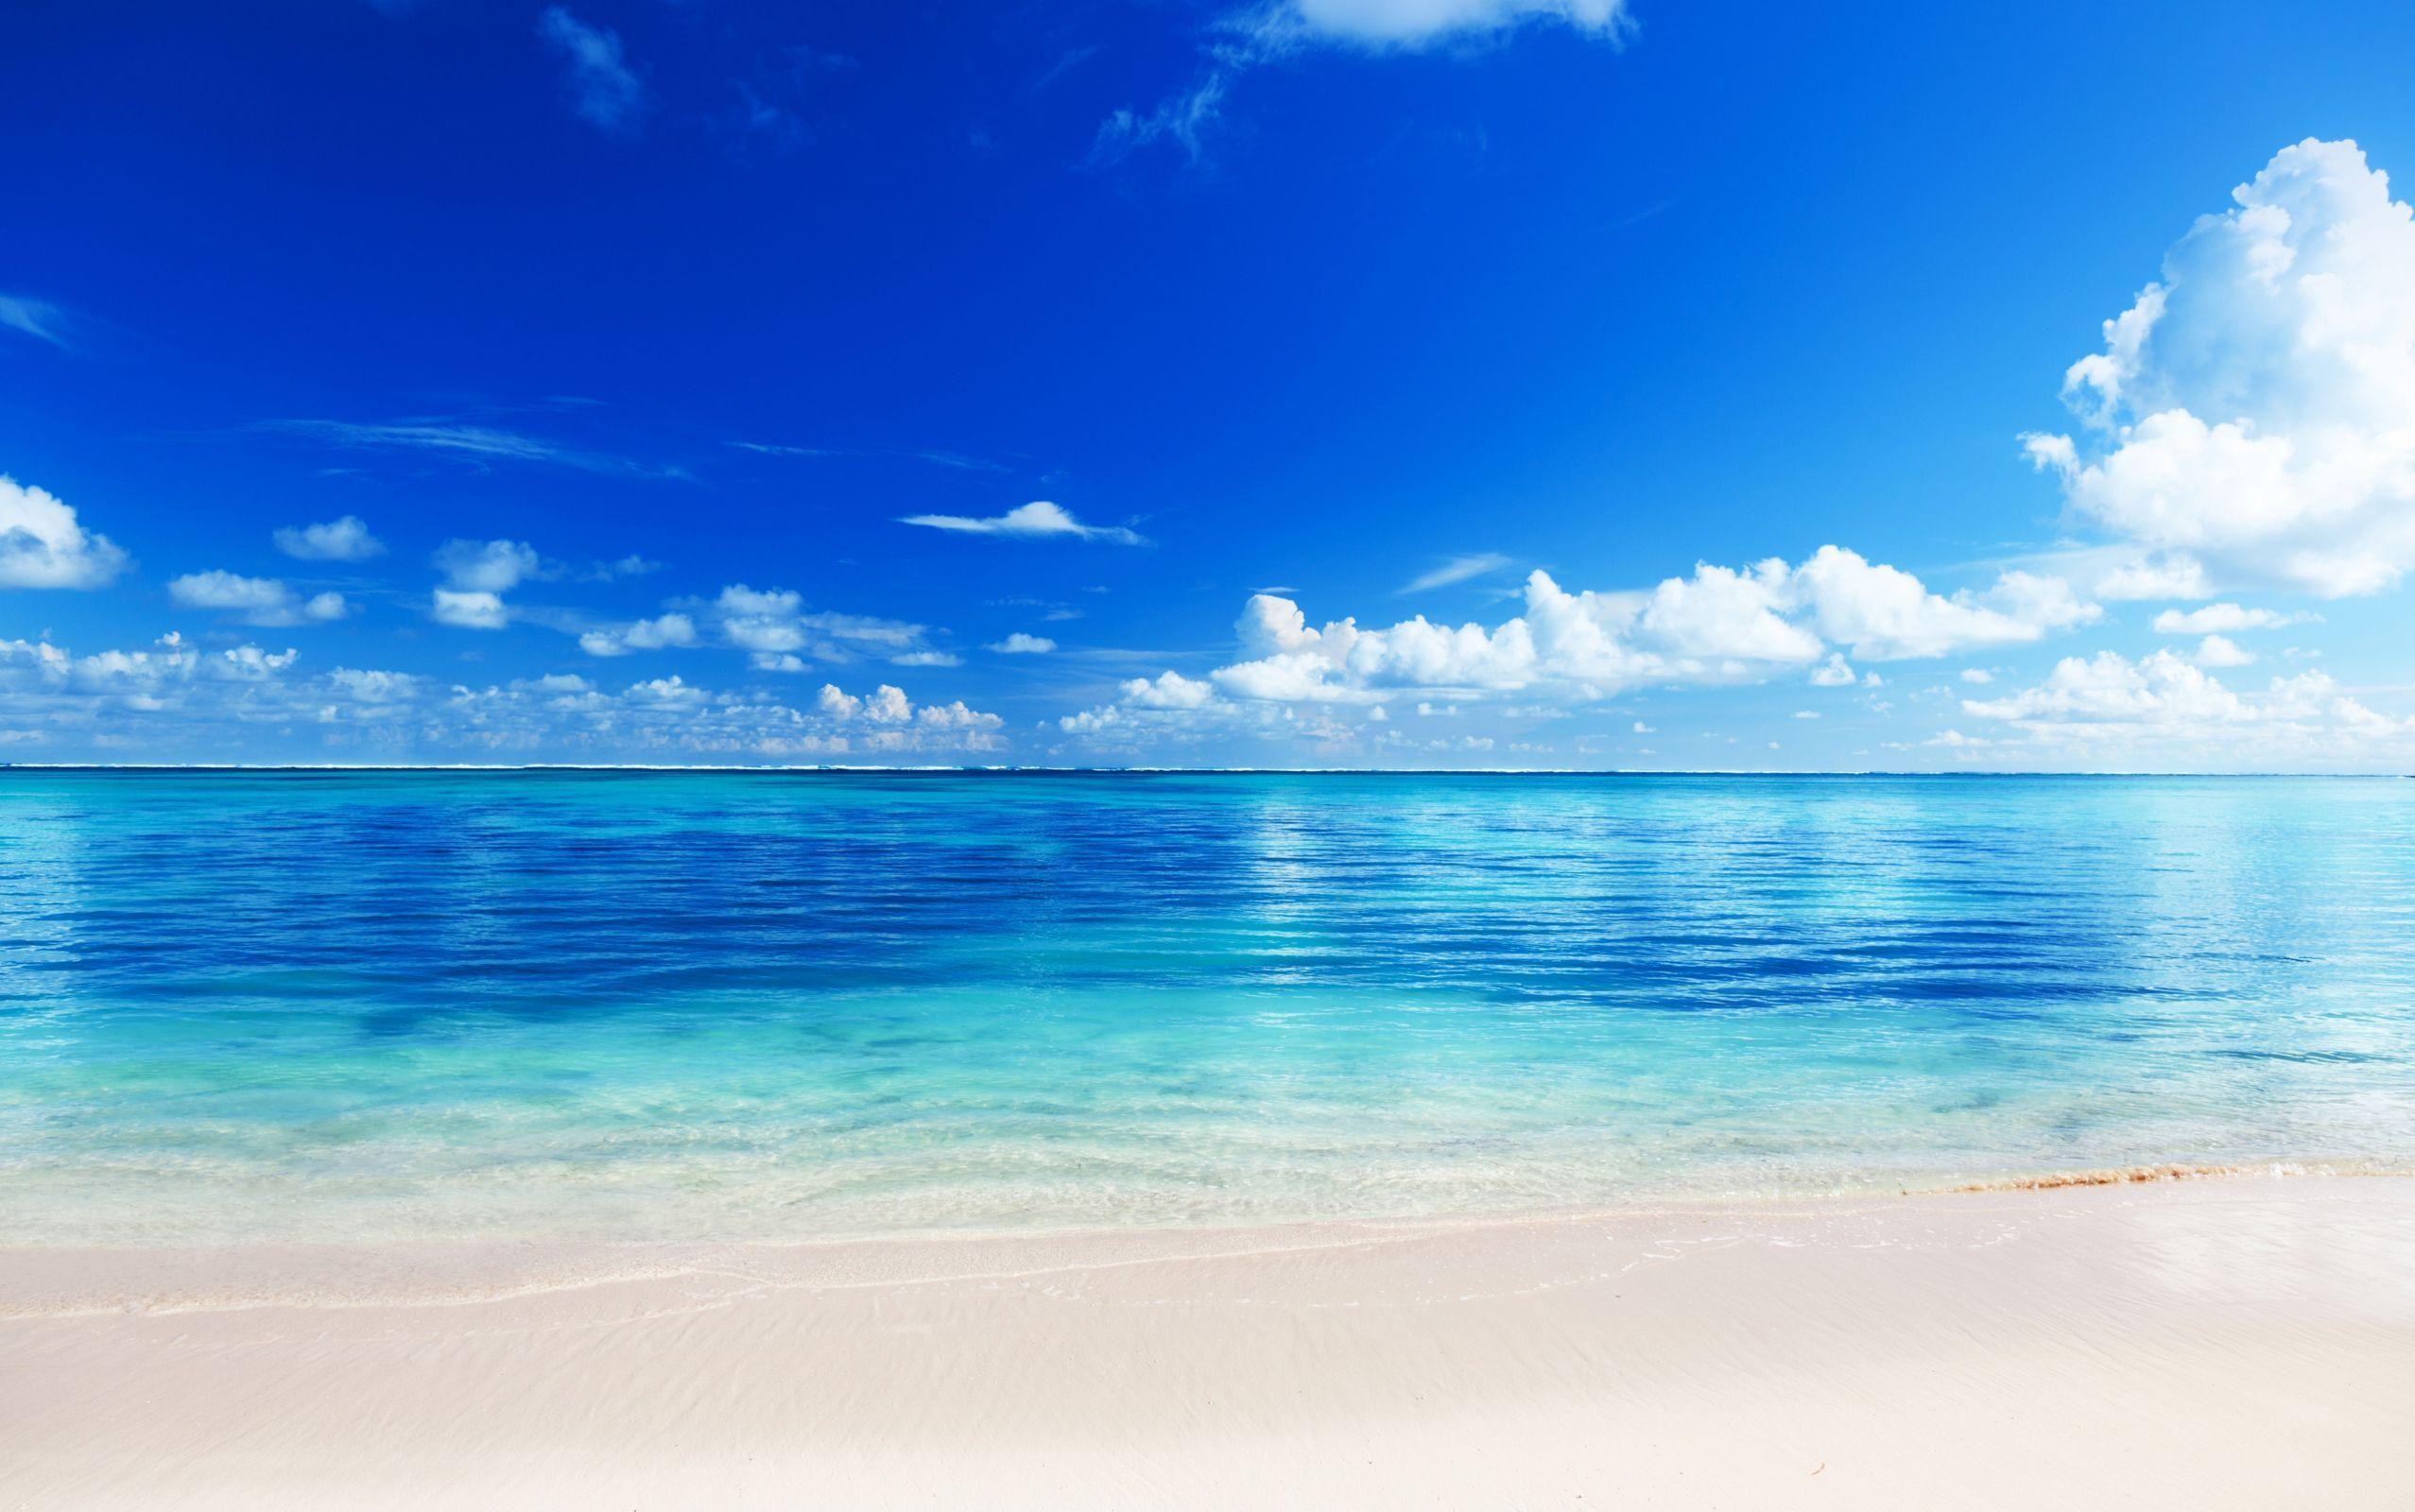 beach background 17574 2555x1600 px ~ hdwallsource. | beach dreams